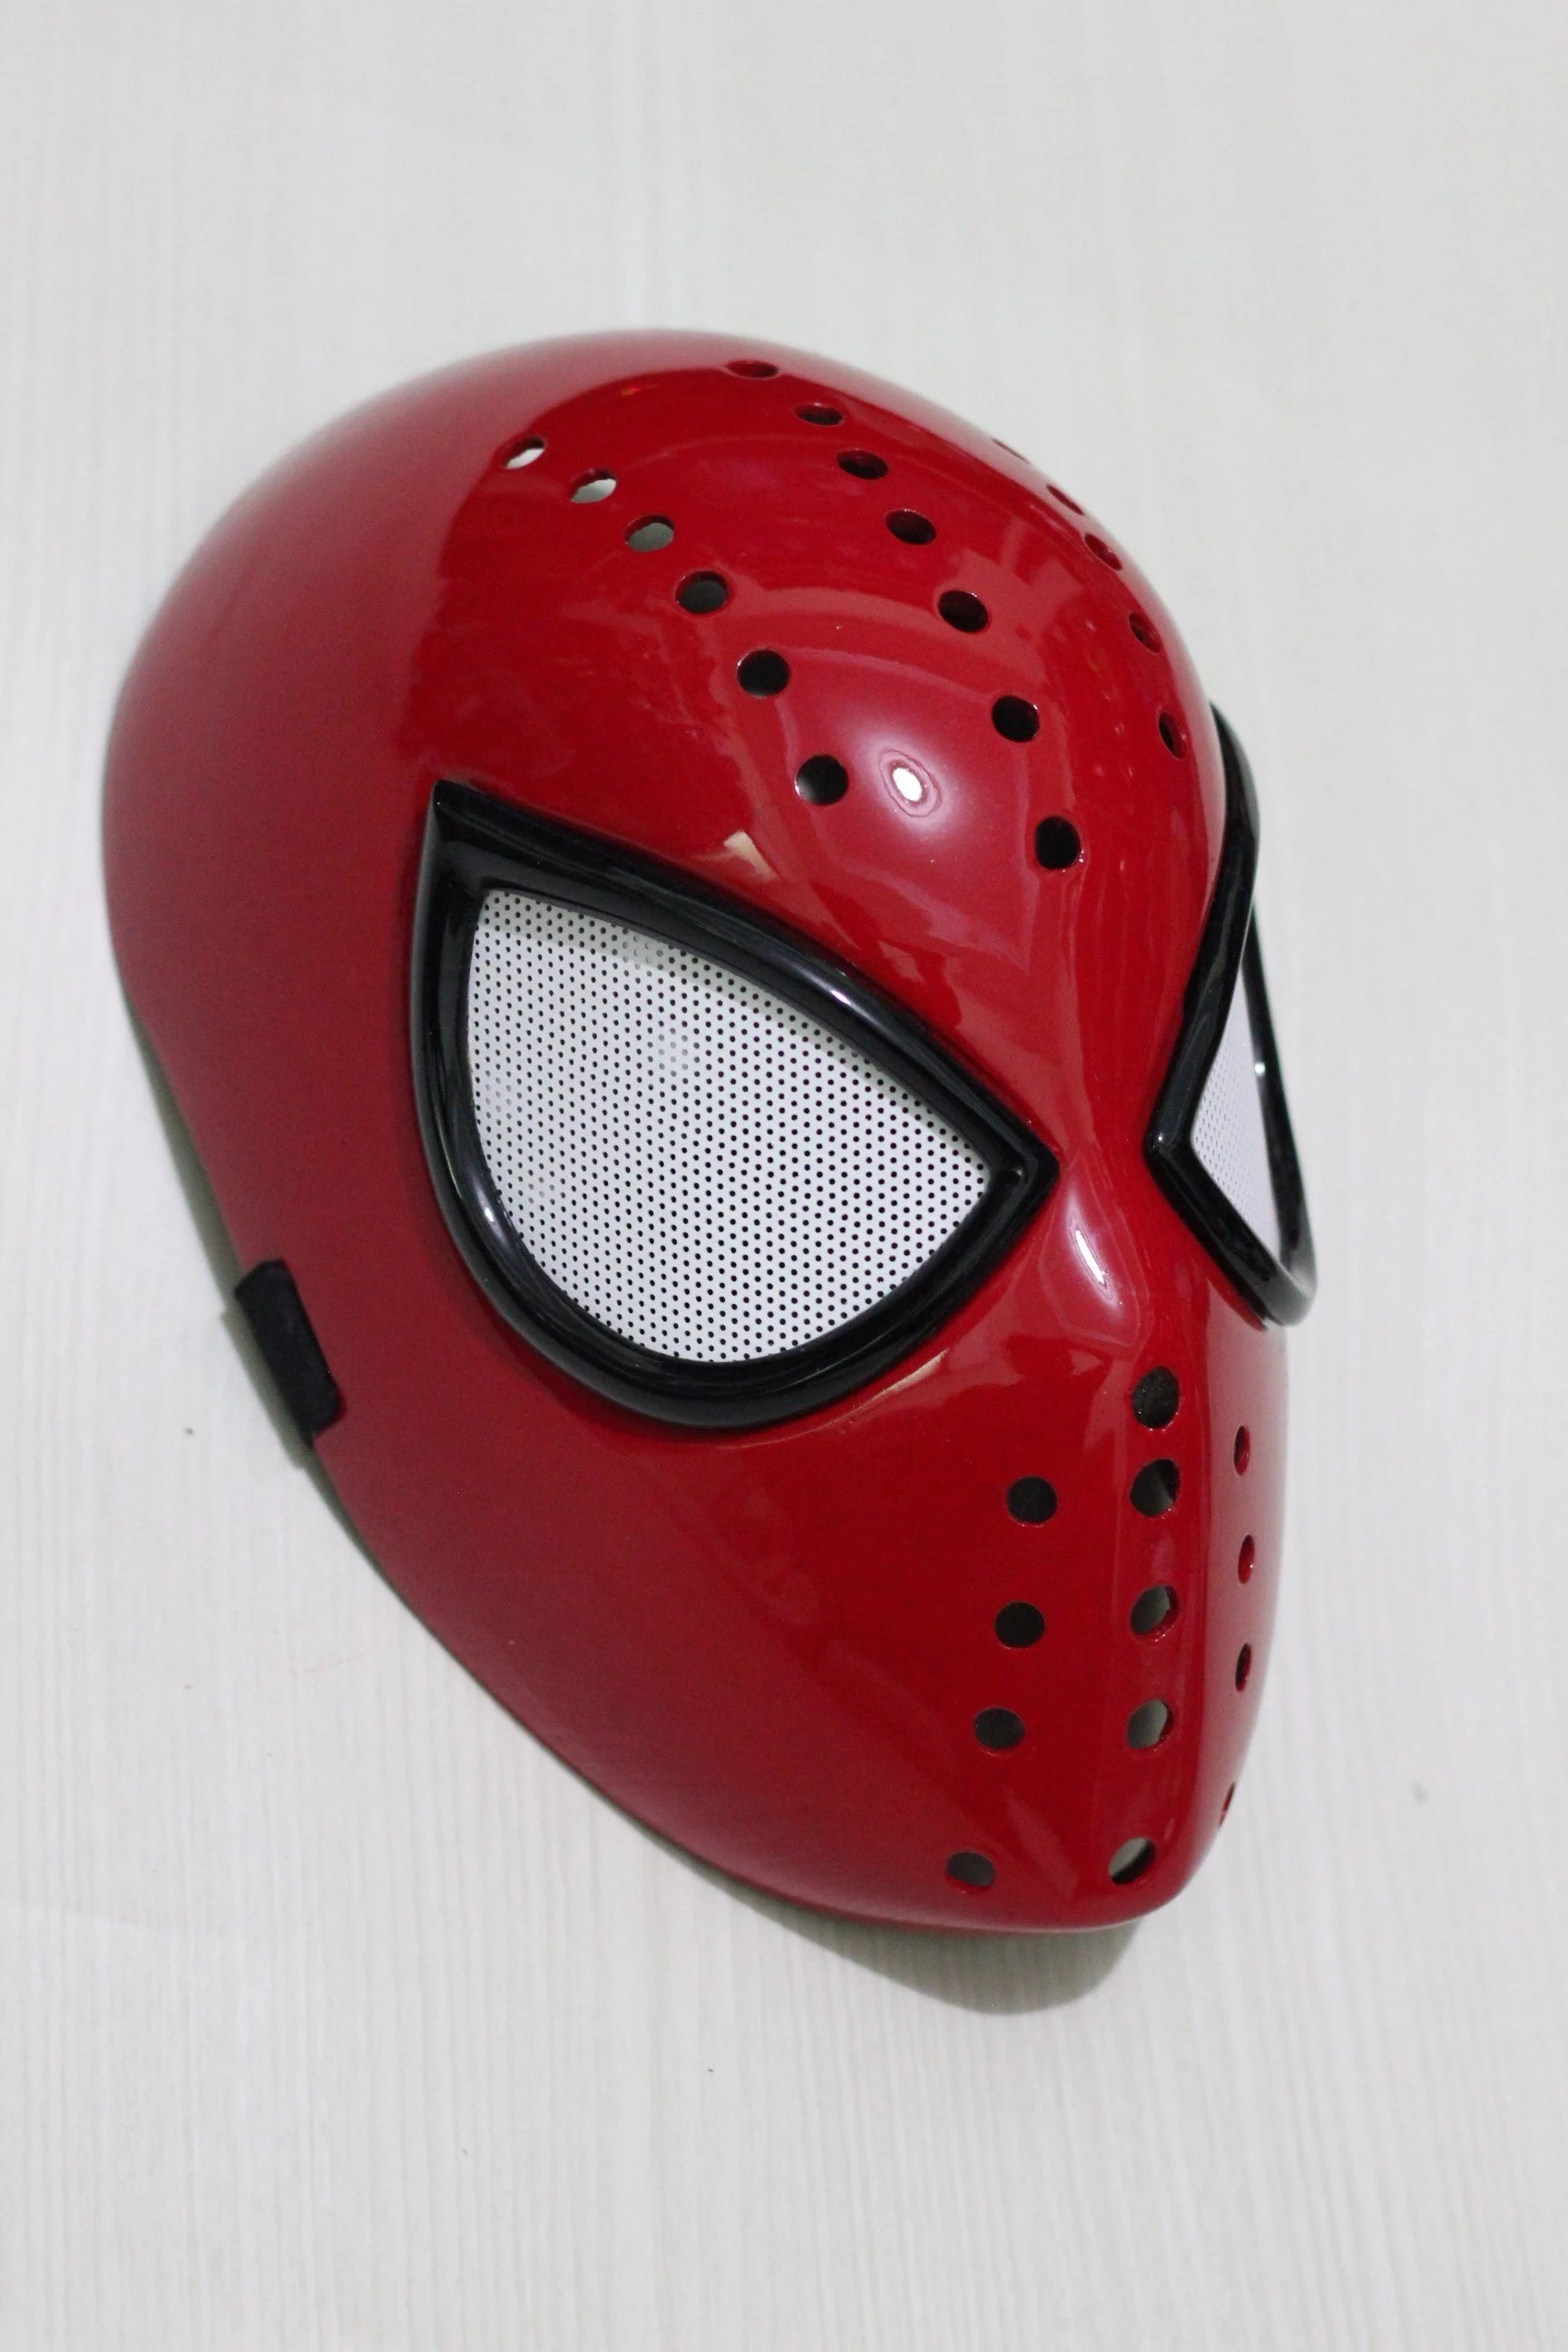 Spiderman Face Shell : spiderman, shell, Amazing, Spiderman, Faceshell, Lenses